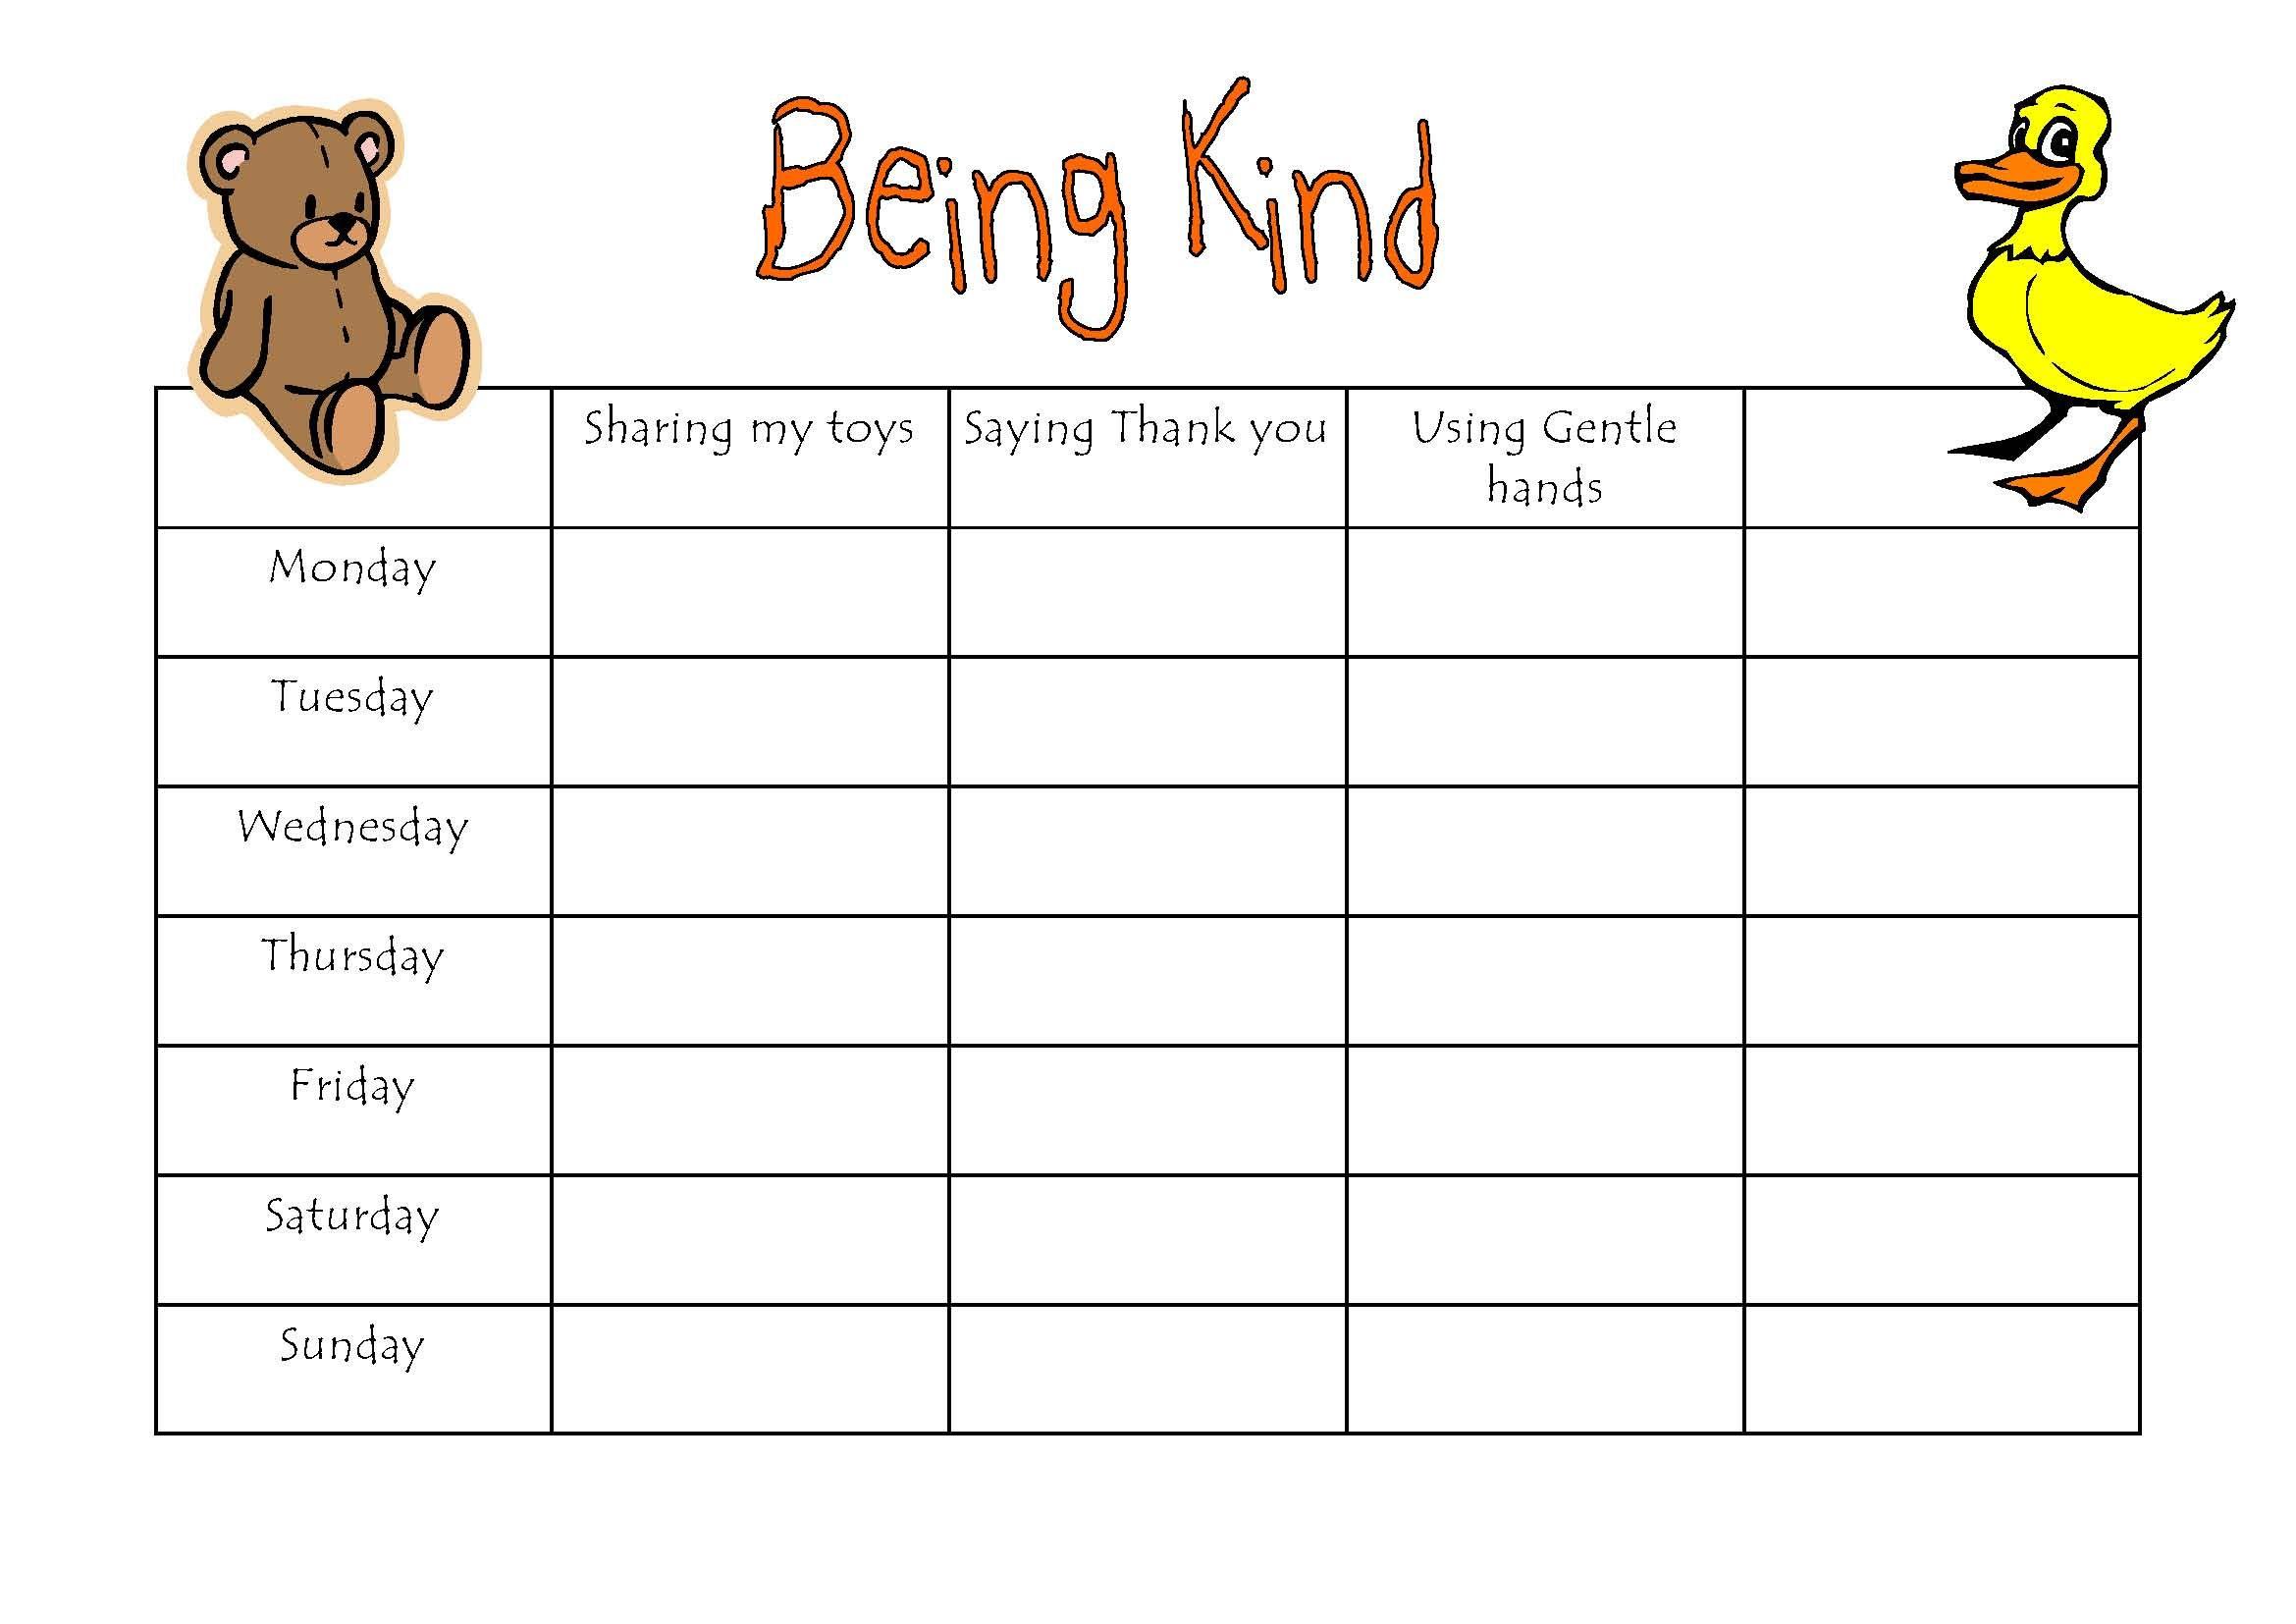 Free Printable Behavior Charts For Kindergarten  Zobi throughout Free Printable Behavior Charts For Kindergarten